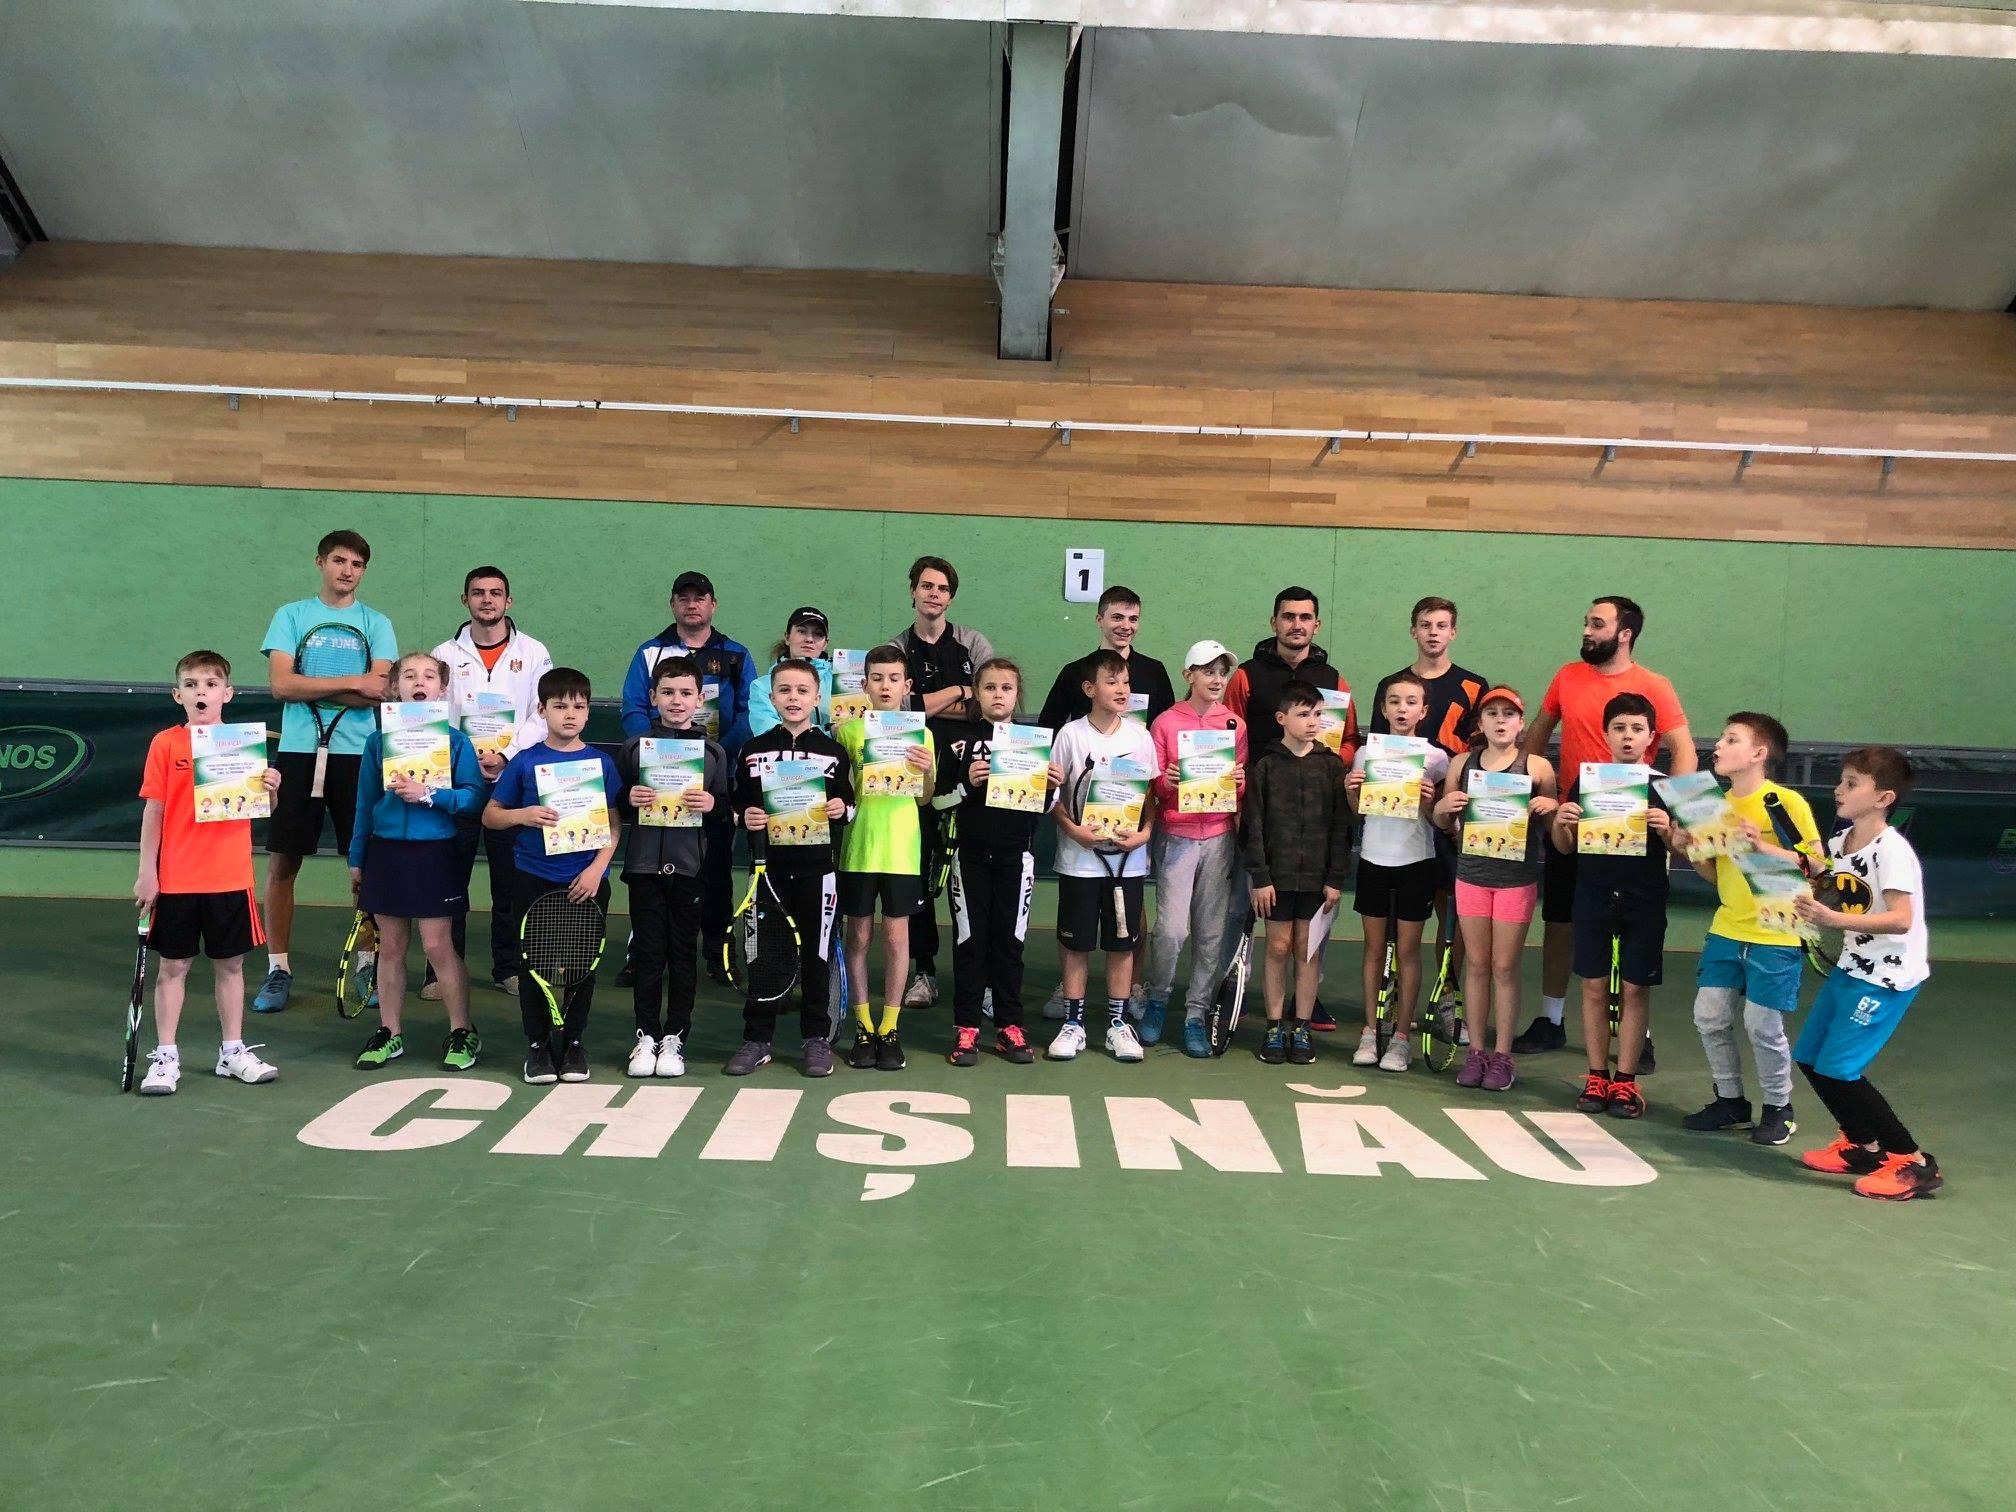 FNTM Tennis 10s Programme a desfășurat primul master-class